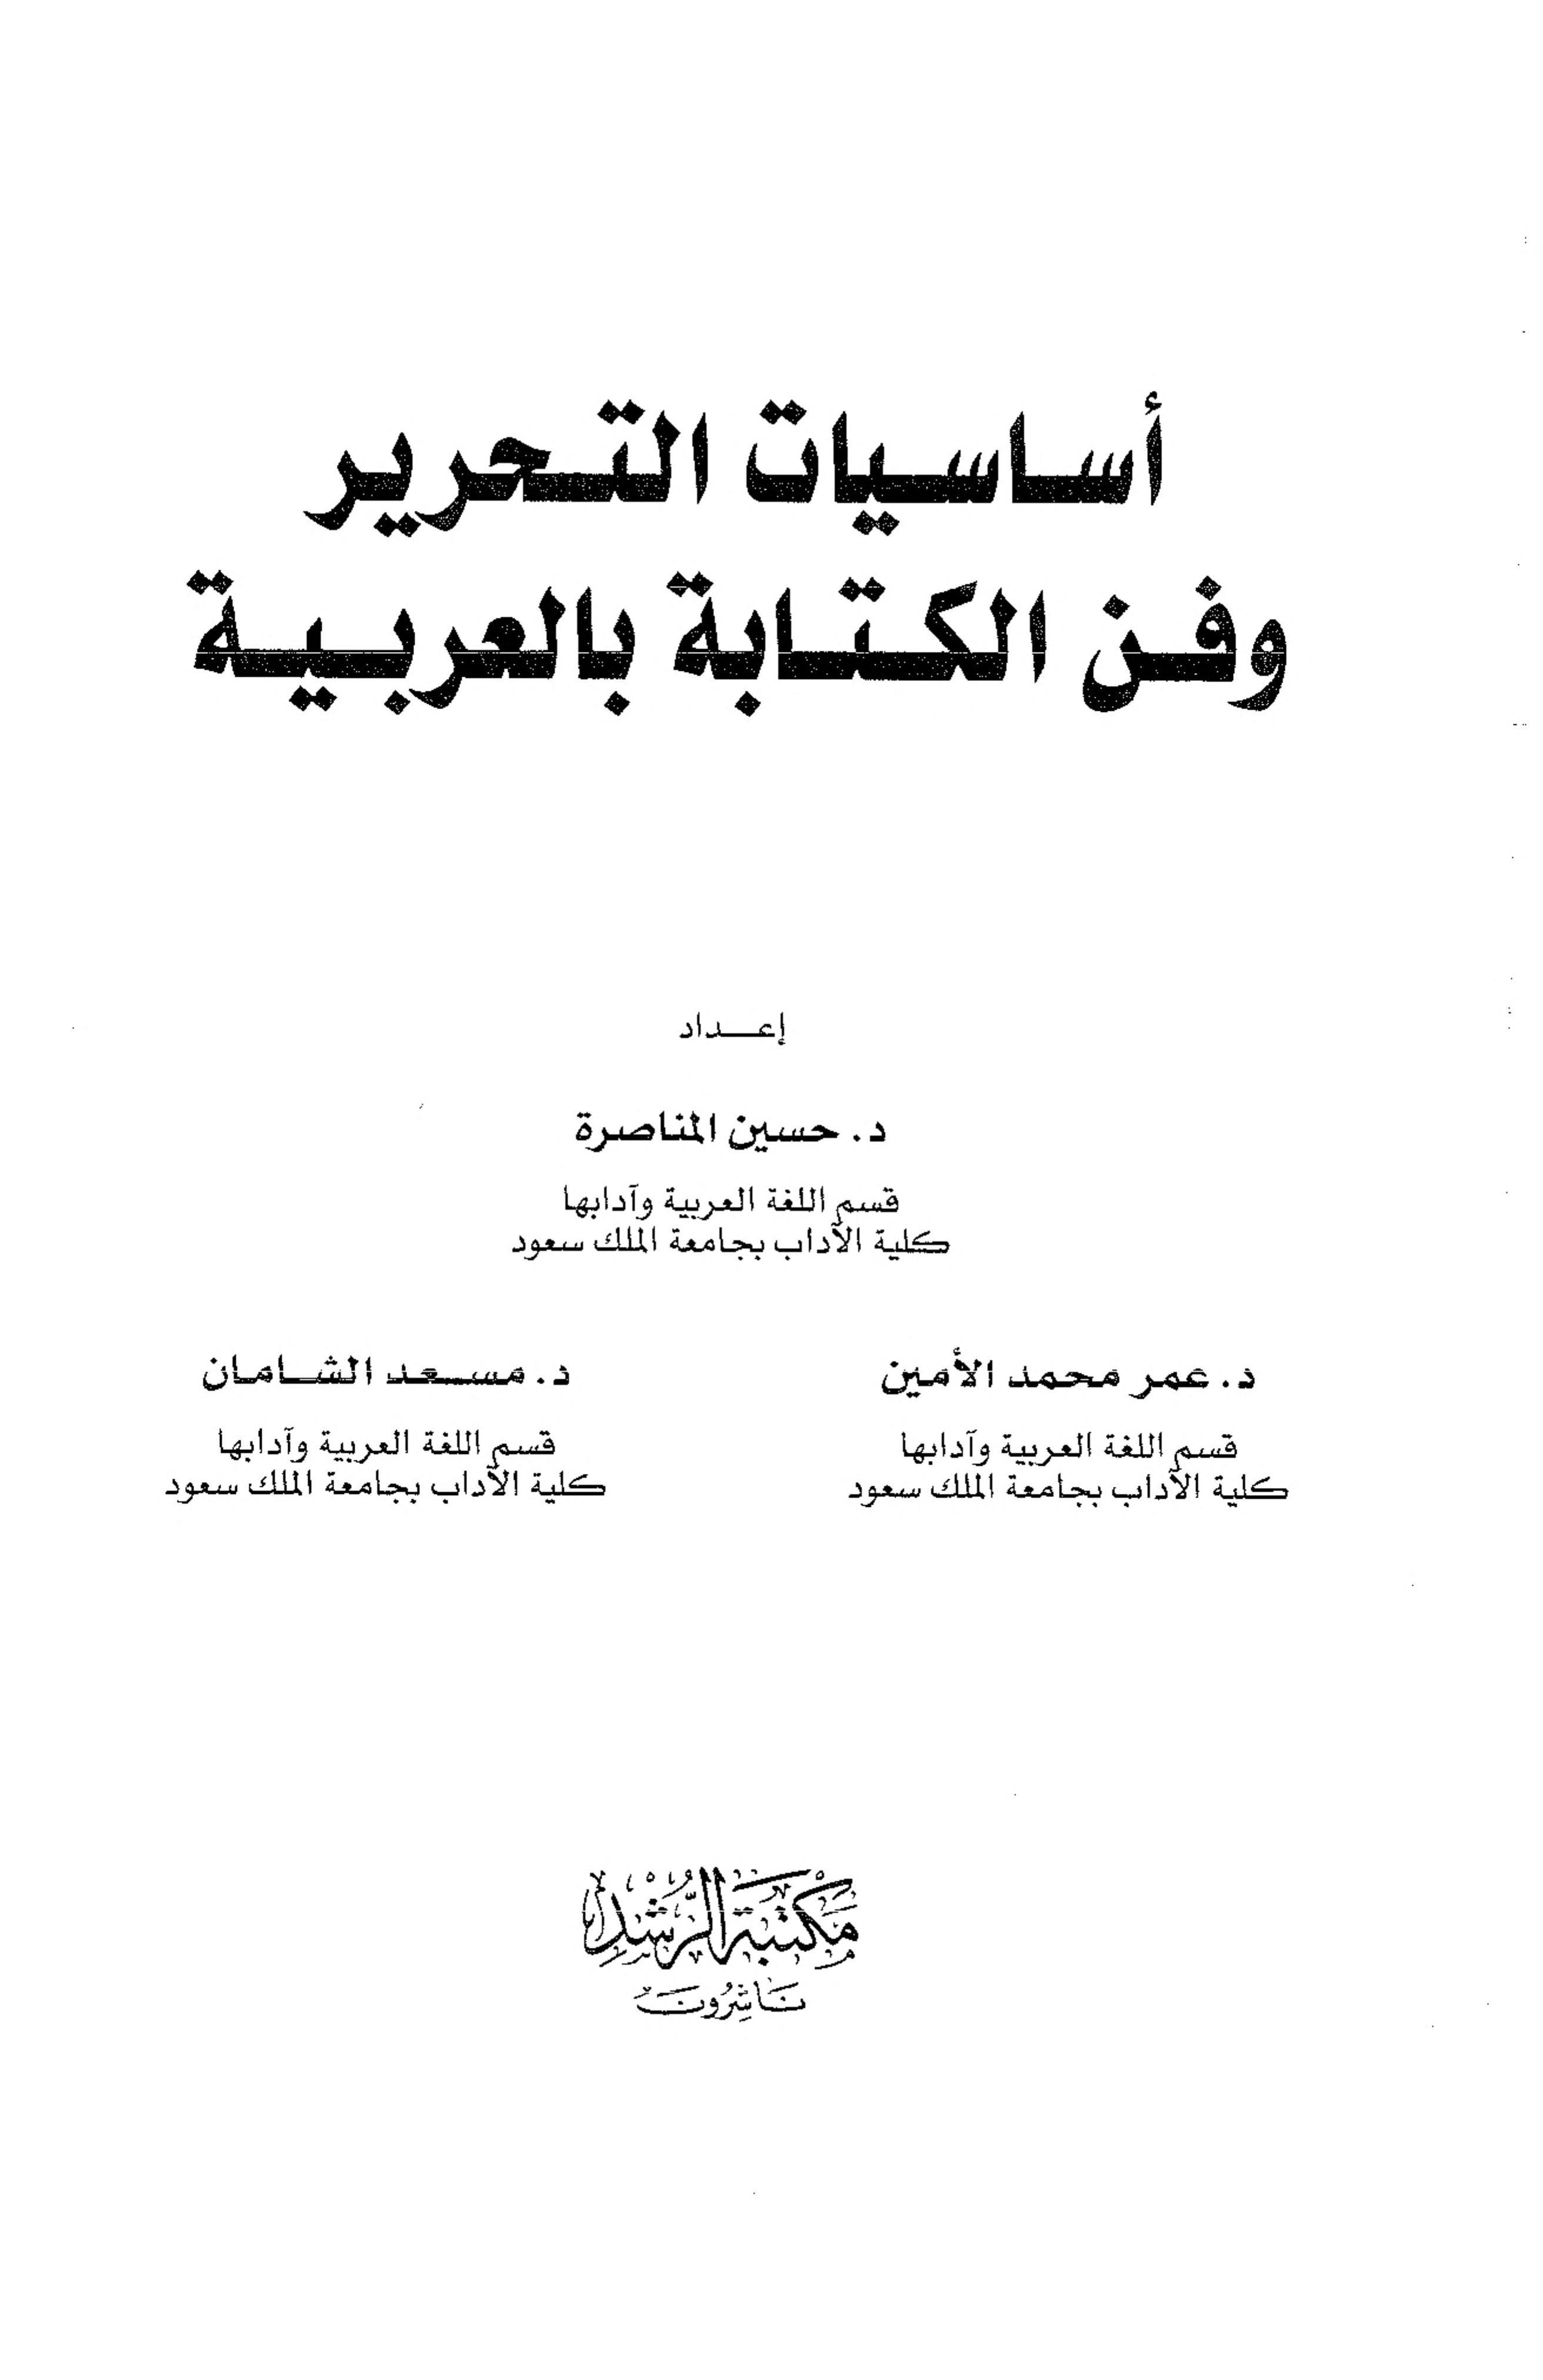 0070 Pdf كتاب أساسيات التحرير وفن الكتابة بالعربية Free Download Borrow And Streaming Internet Archive Pdf Books Reading Writing A Book Arabic Books